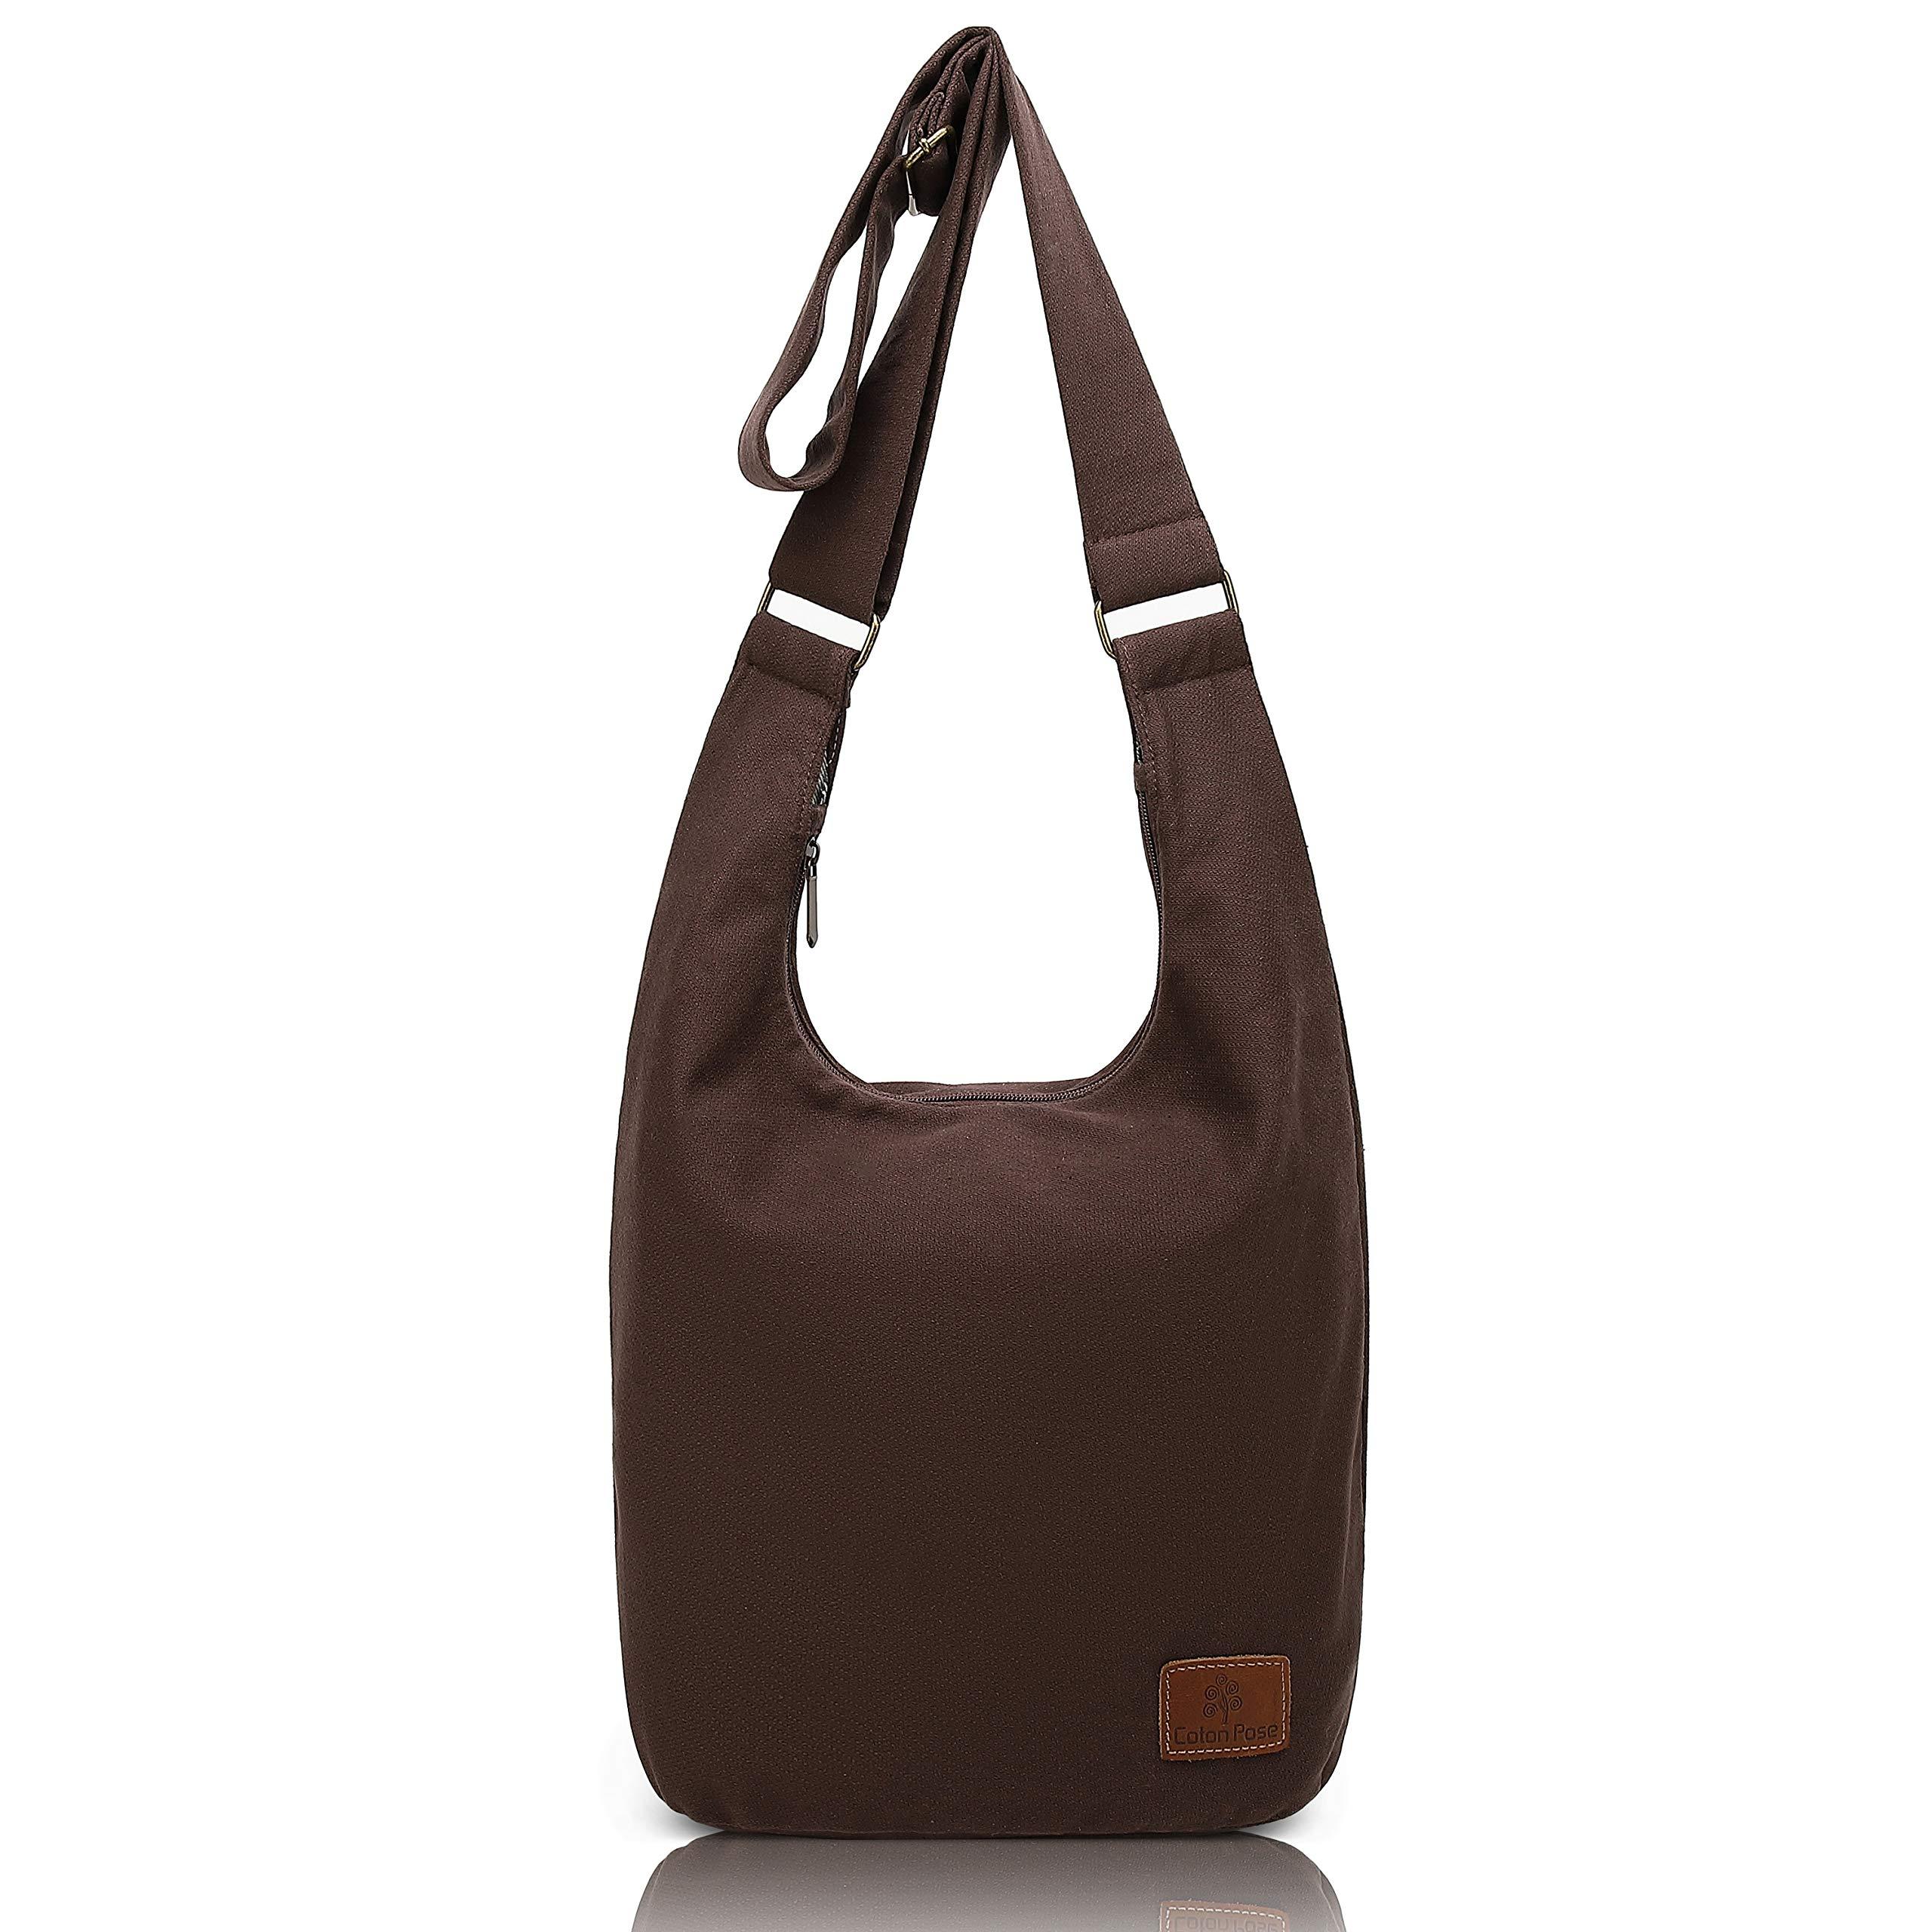 Hippie Crossbody Bag Top Zip Cotton Sling Bag Jacquard cloth Handmade Bags